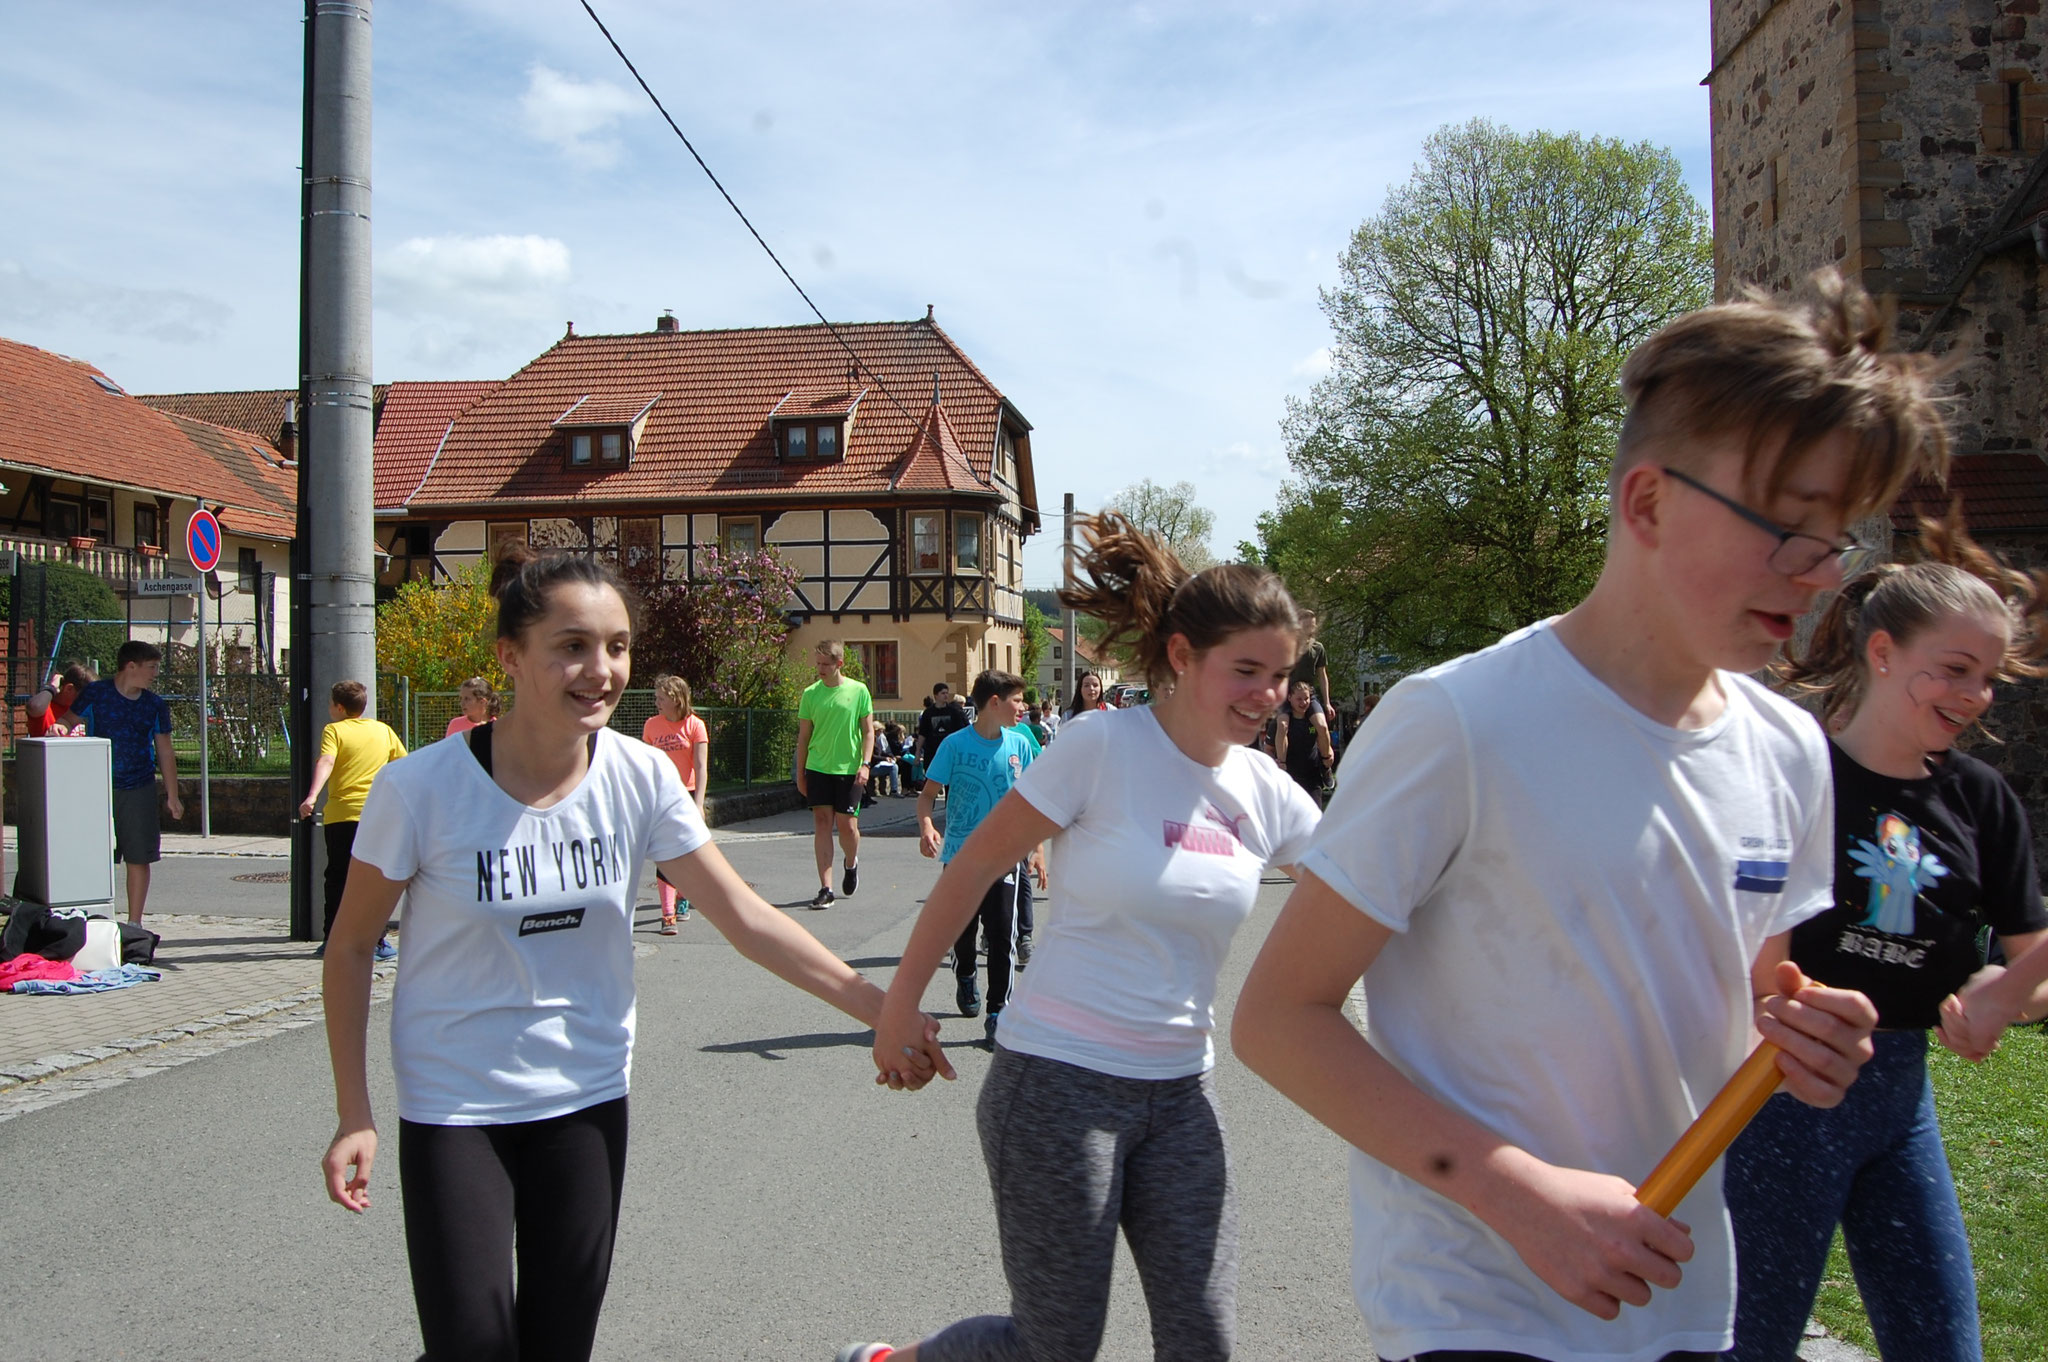 Staatliche Gemeinschaftsschule Grabfeld - Gemeinschaftsschule Grabfeld